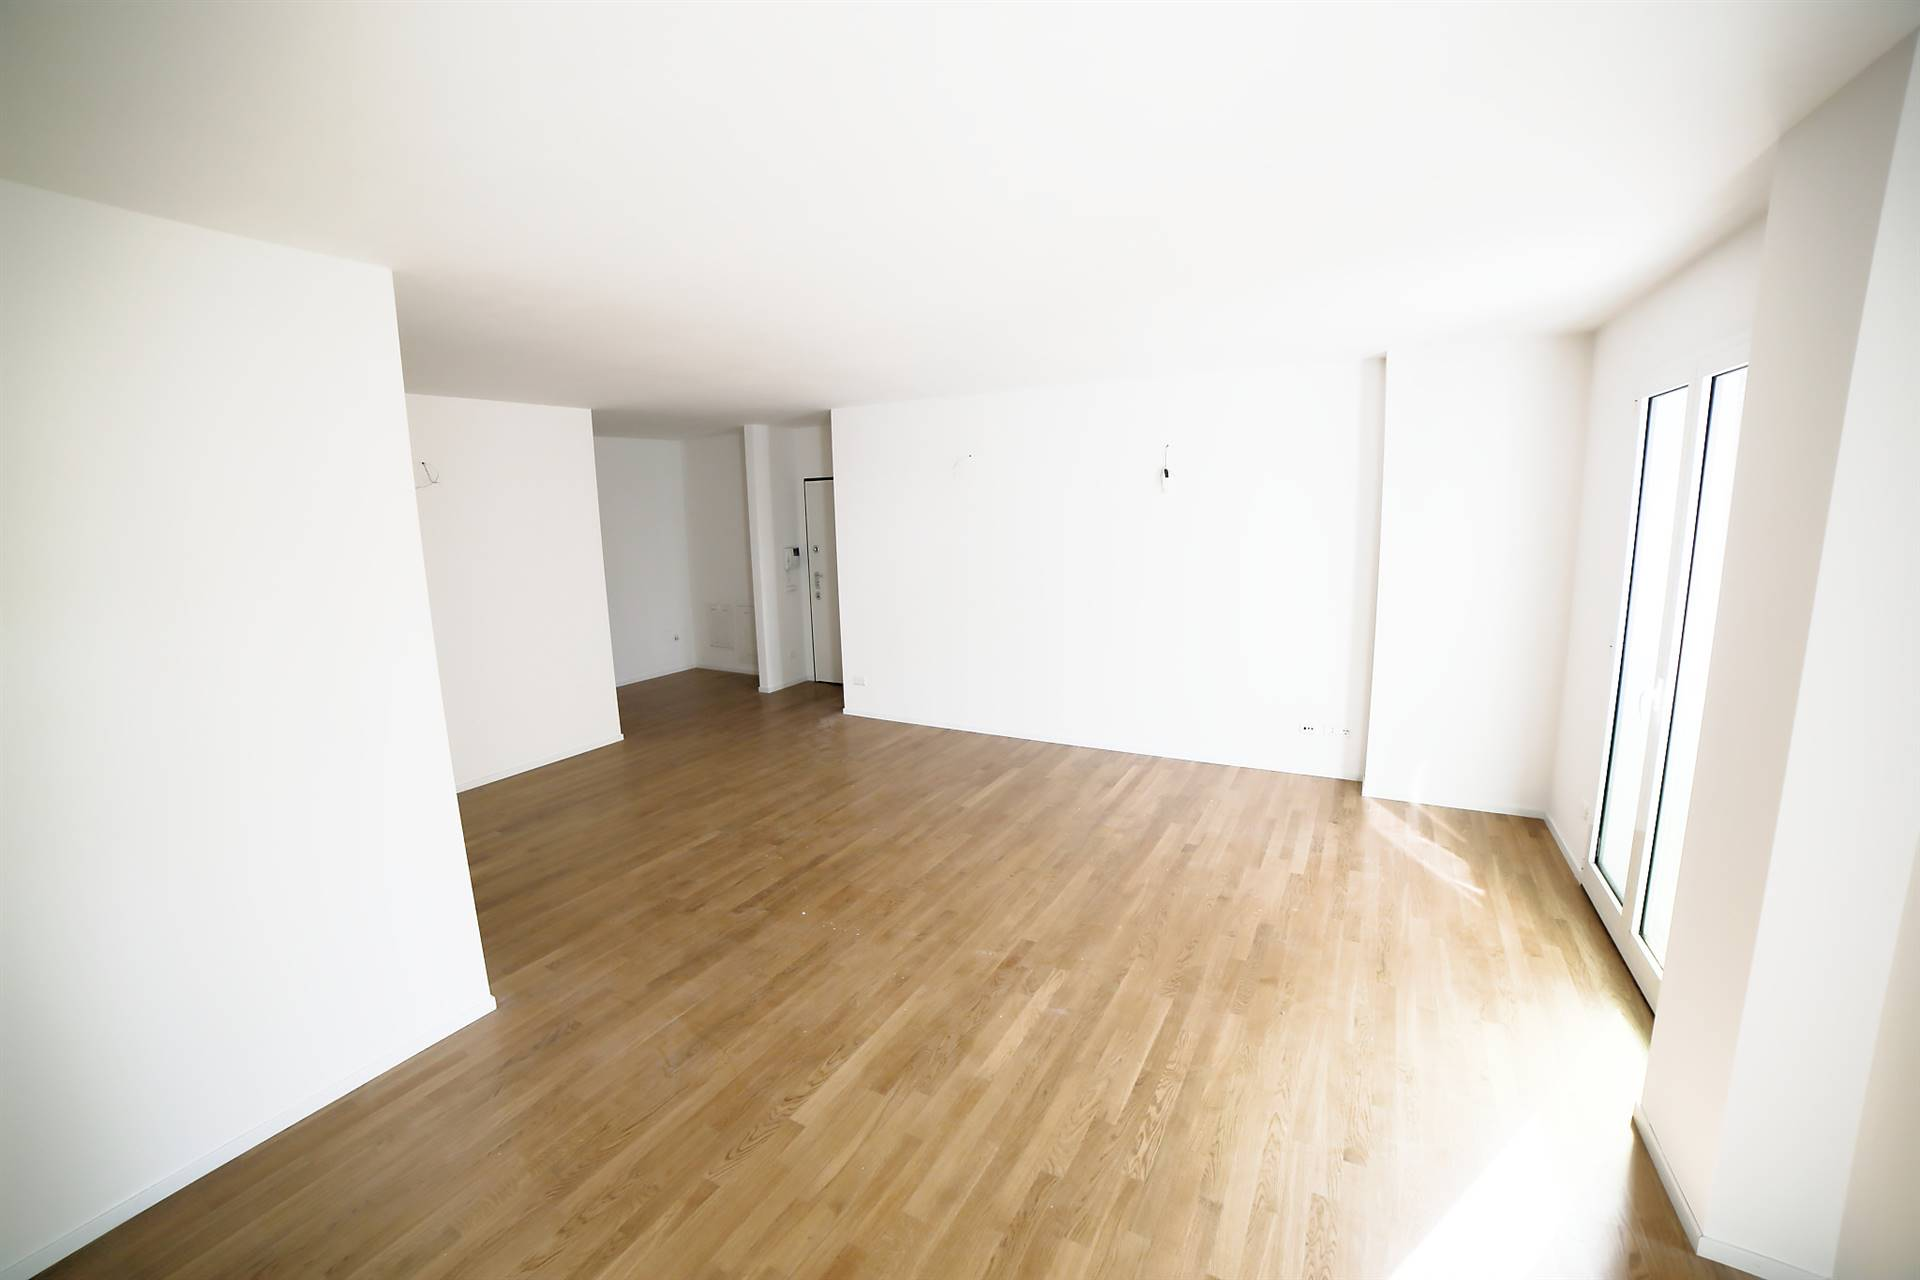 Apartment in MONZA